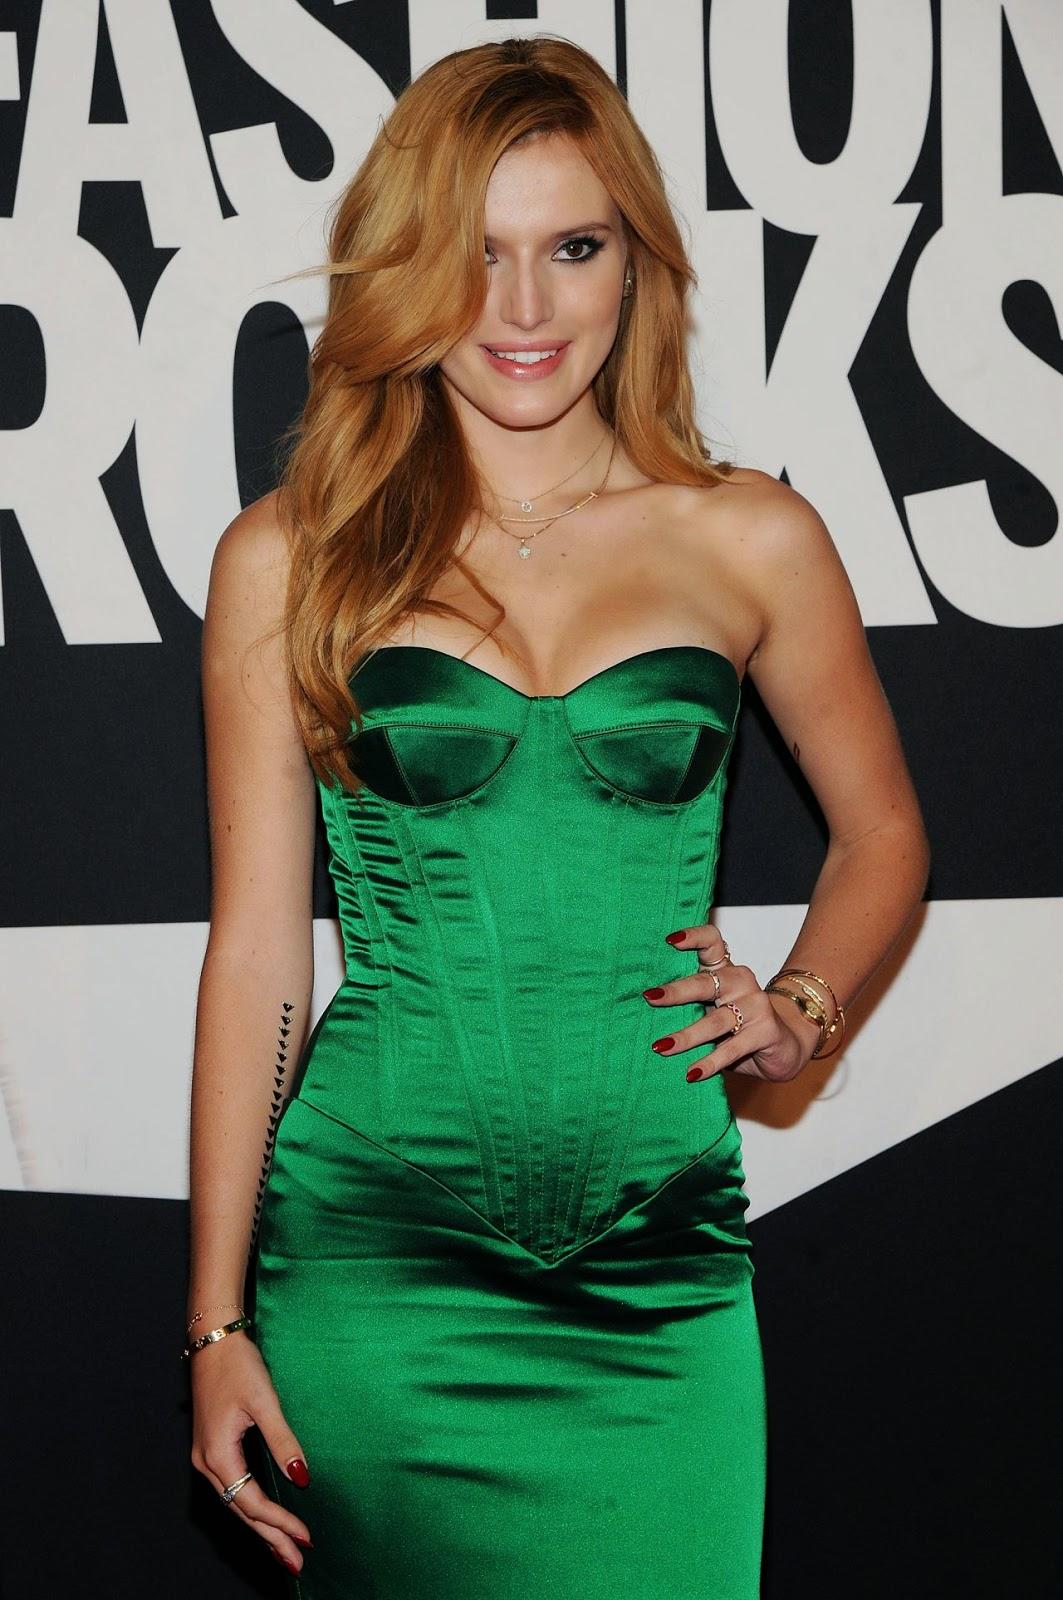 Bella Thorne Breast Implants